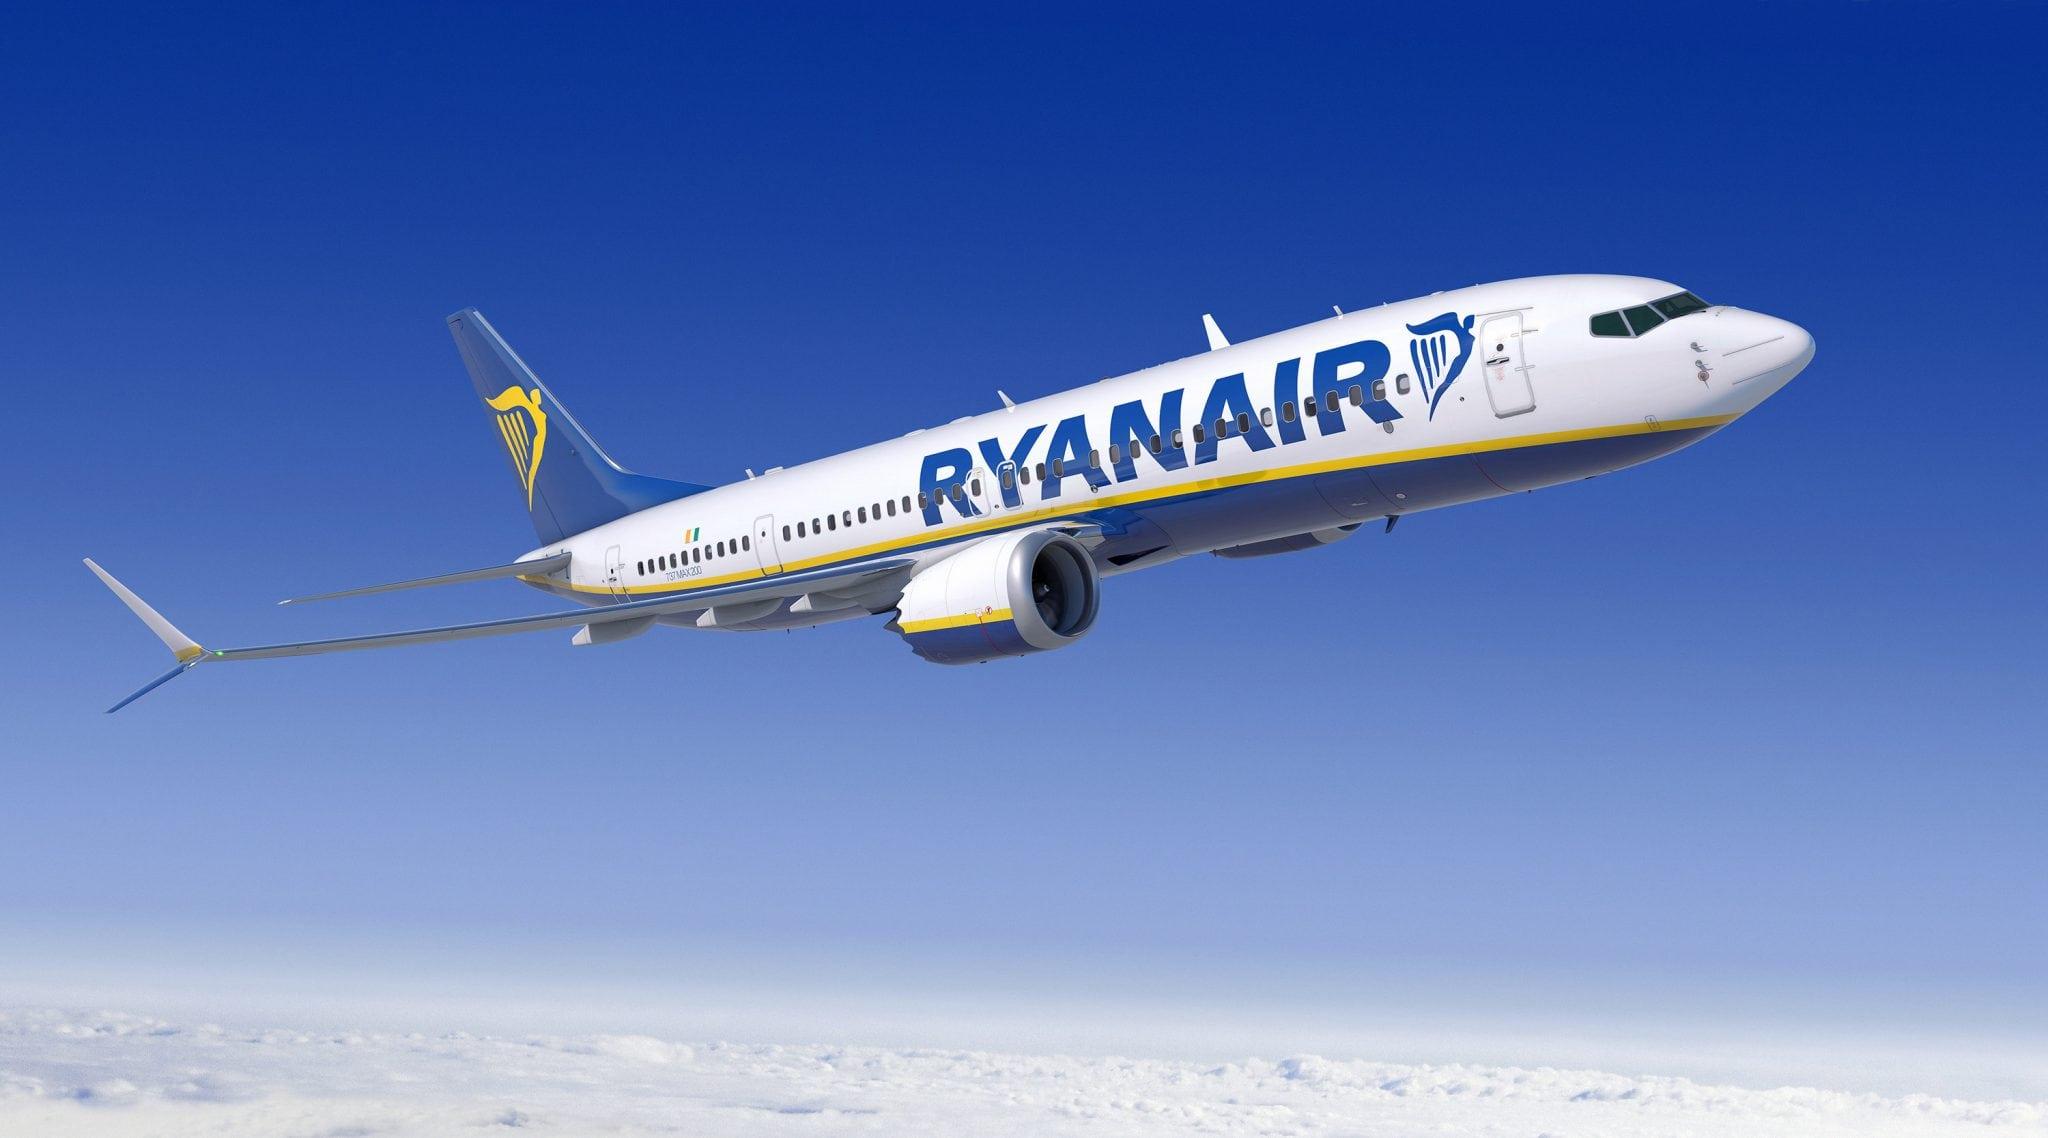 A rendering of the Ryanair Boeing 737 Max 200